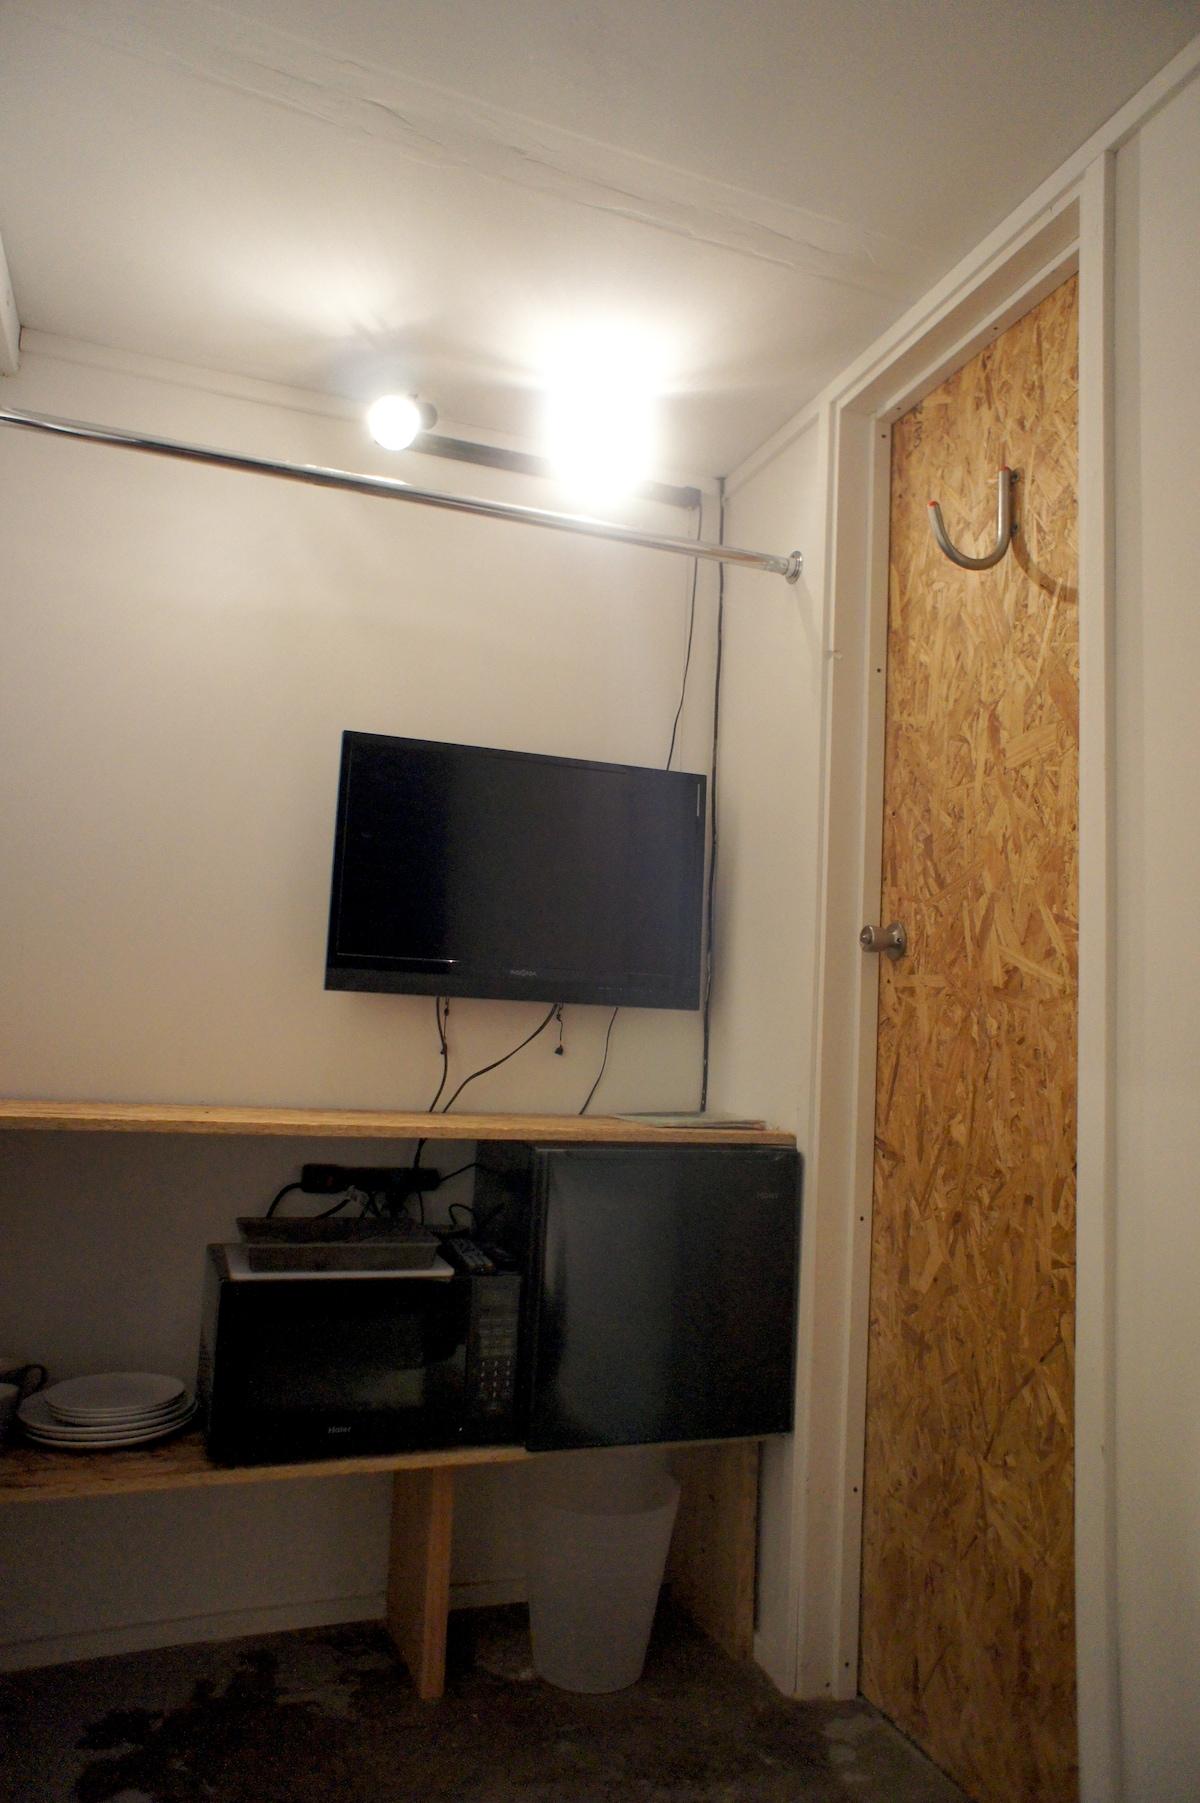 TV with NETFLIX, mini fridge and microwave